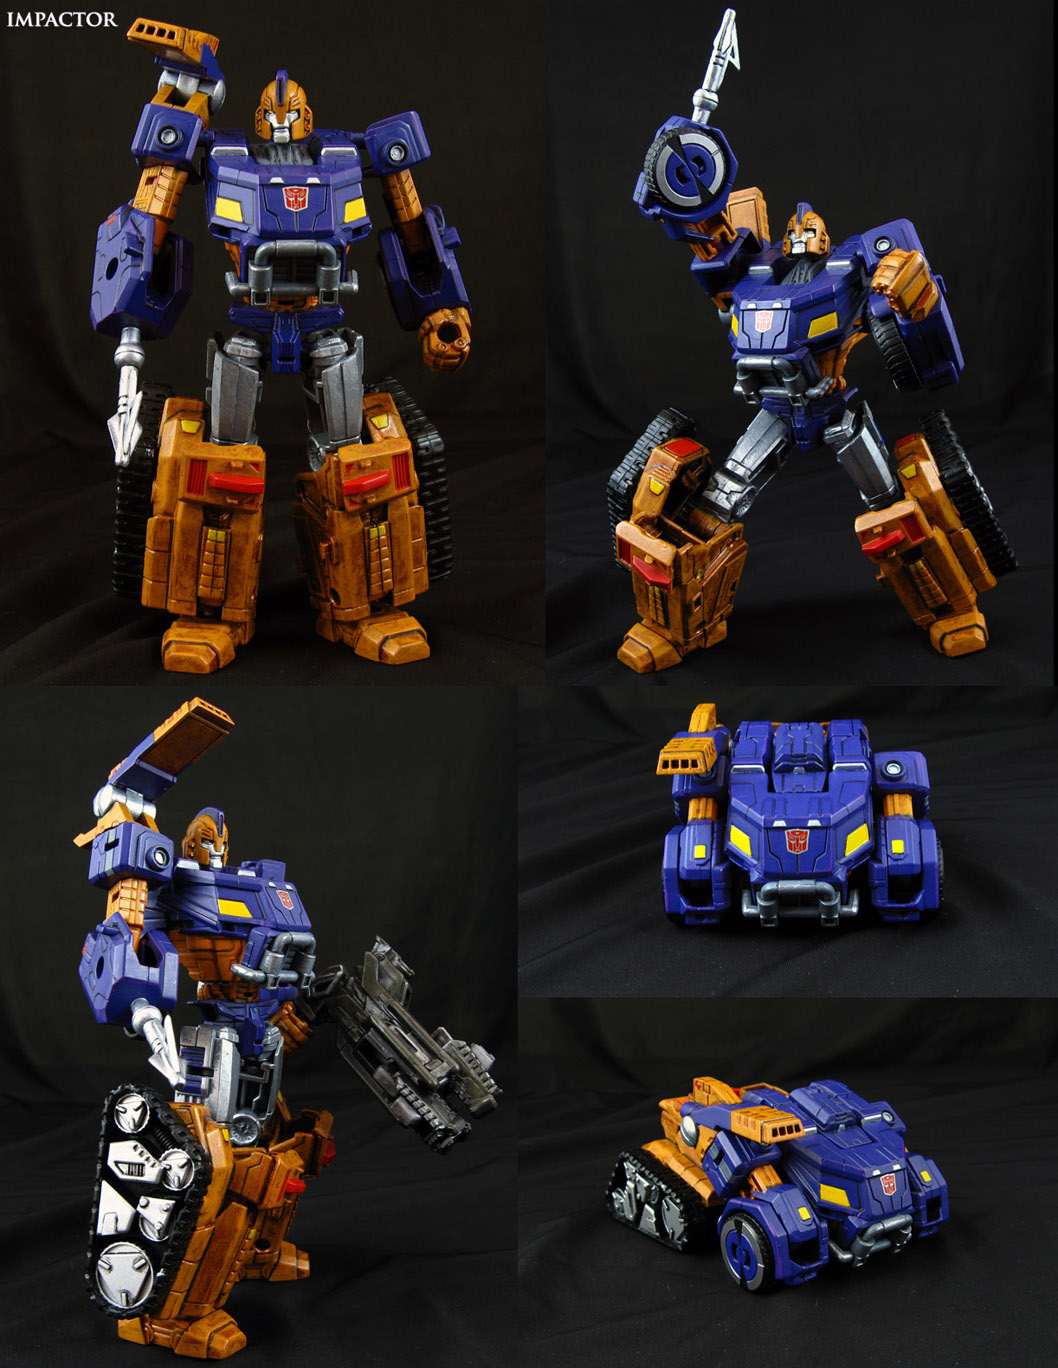 Custom Transformers Impactor Figure by Jin-Saotome